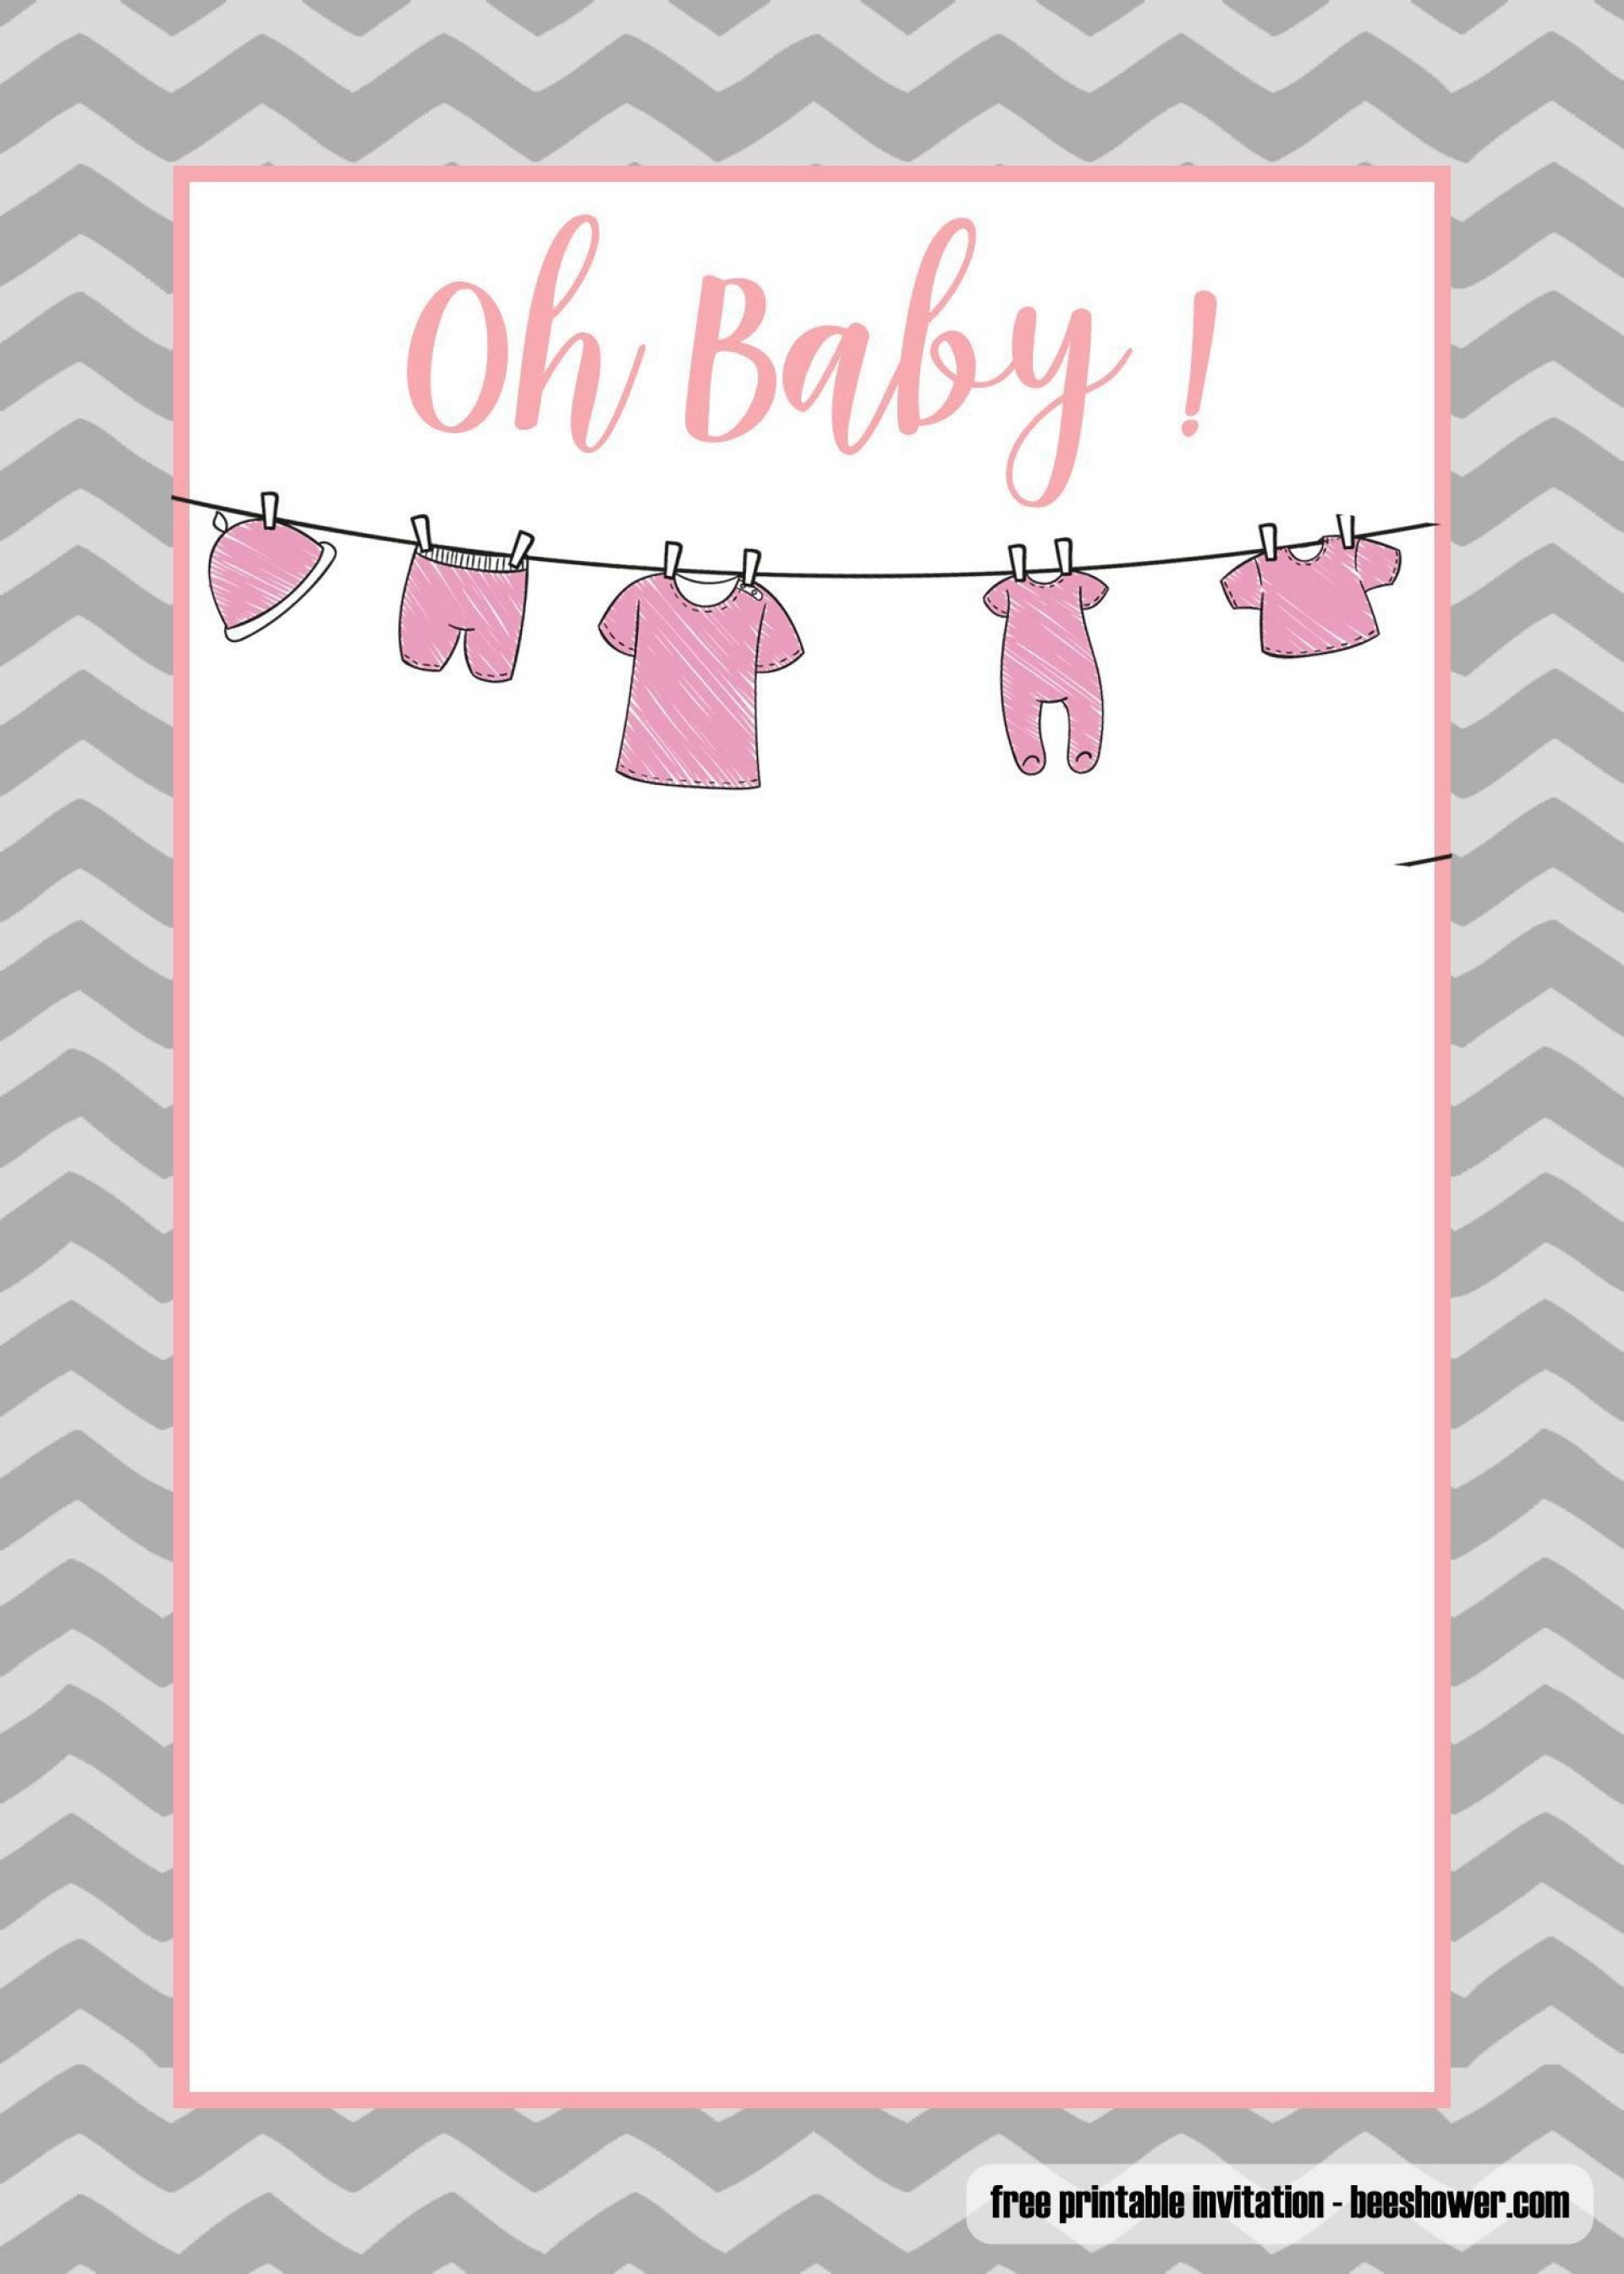 006 Unusual Baby Shower Invitation Template Microsoft Word High Resolution  Free Editable1920